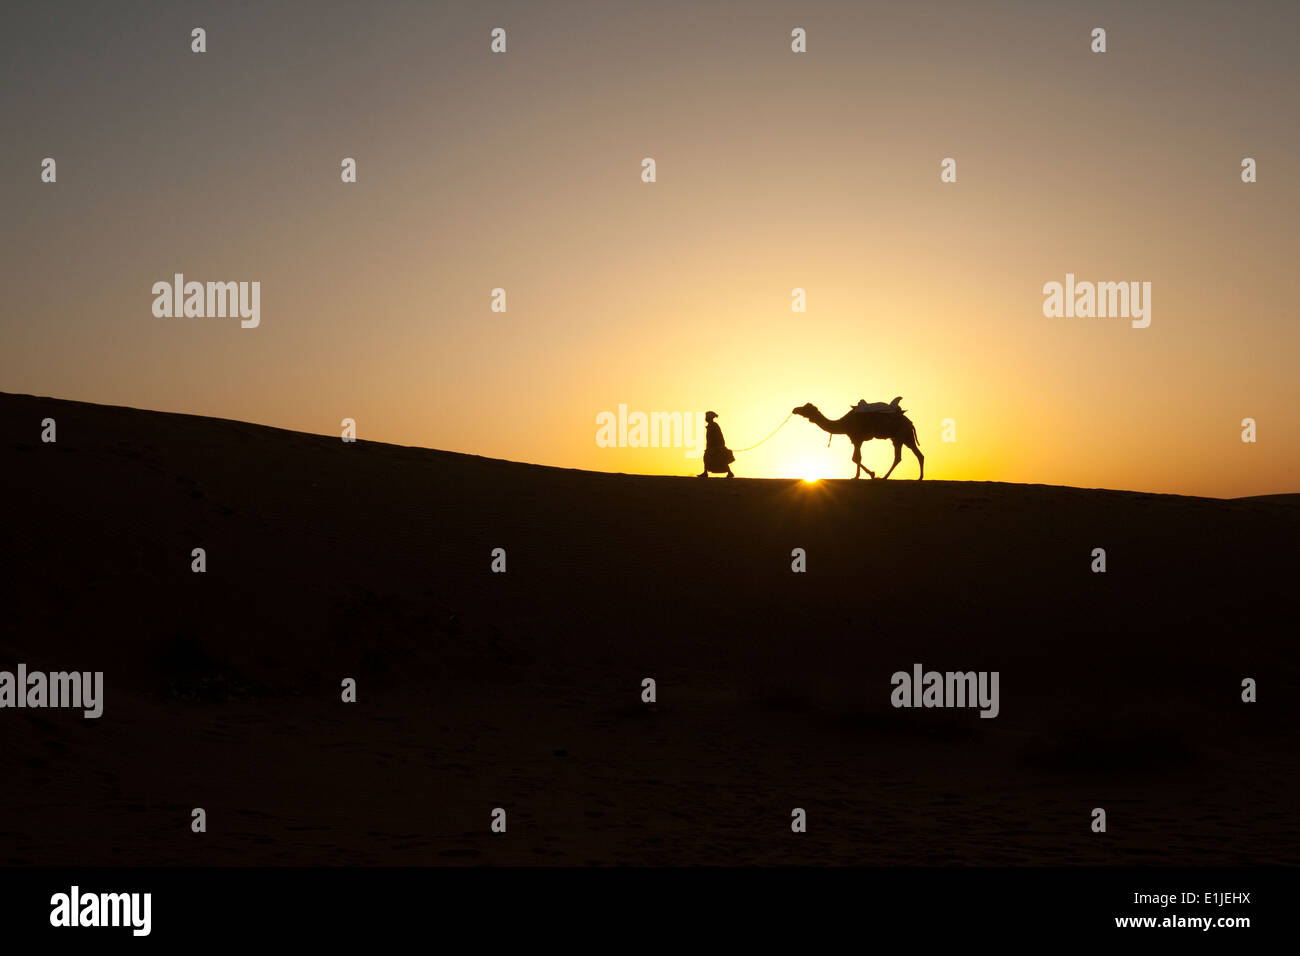 Hombre caminando con camellos al atardecer en el desierto de Thar, Jaiselmer, India Imagen De Stock